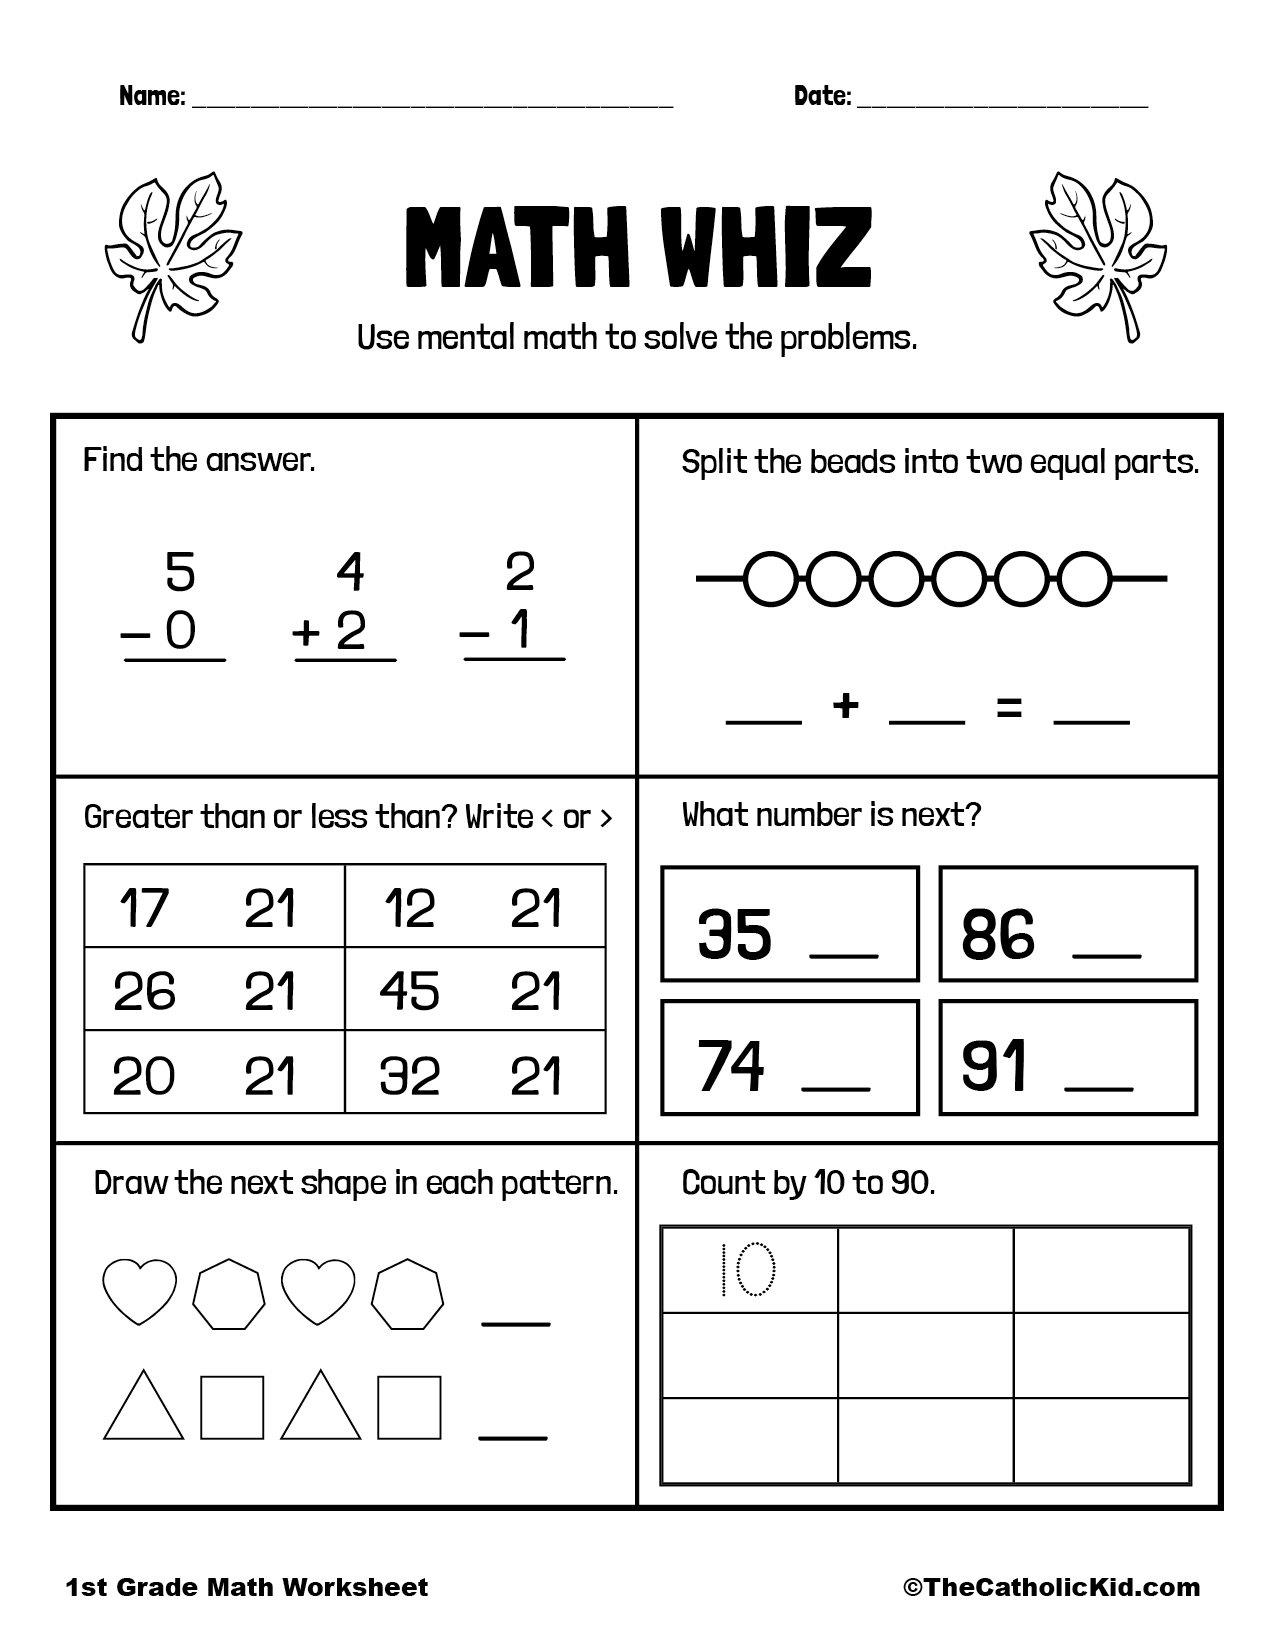 Math Review Page - 1st Grade Math Worksheet Catholic